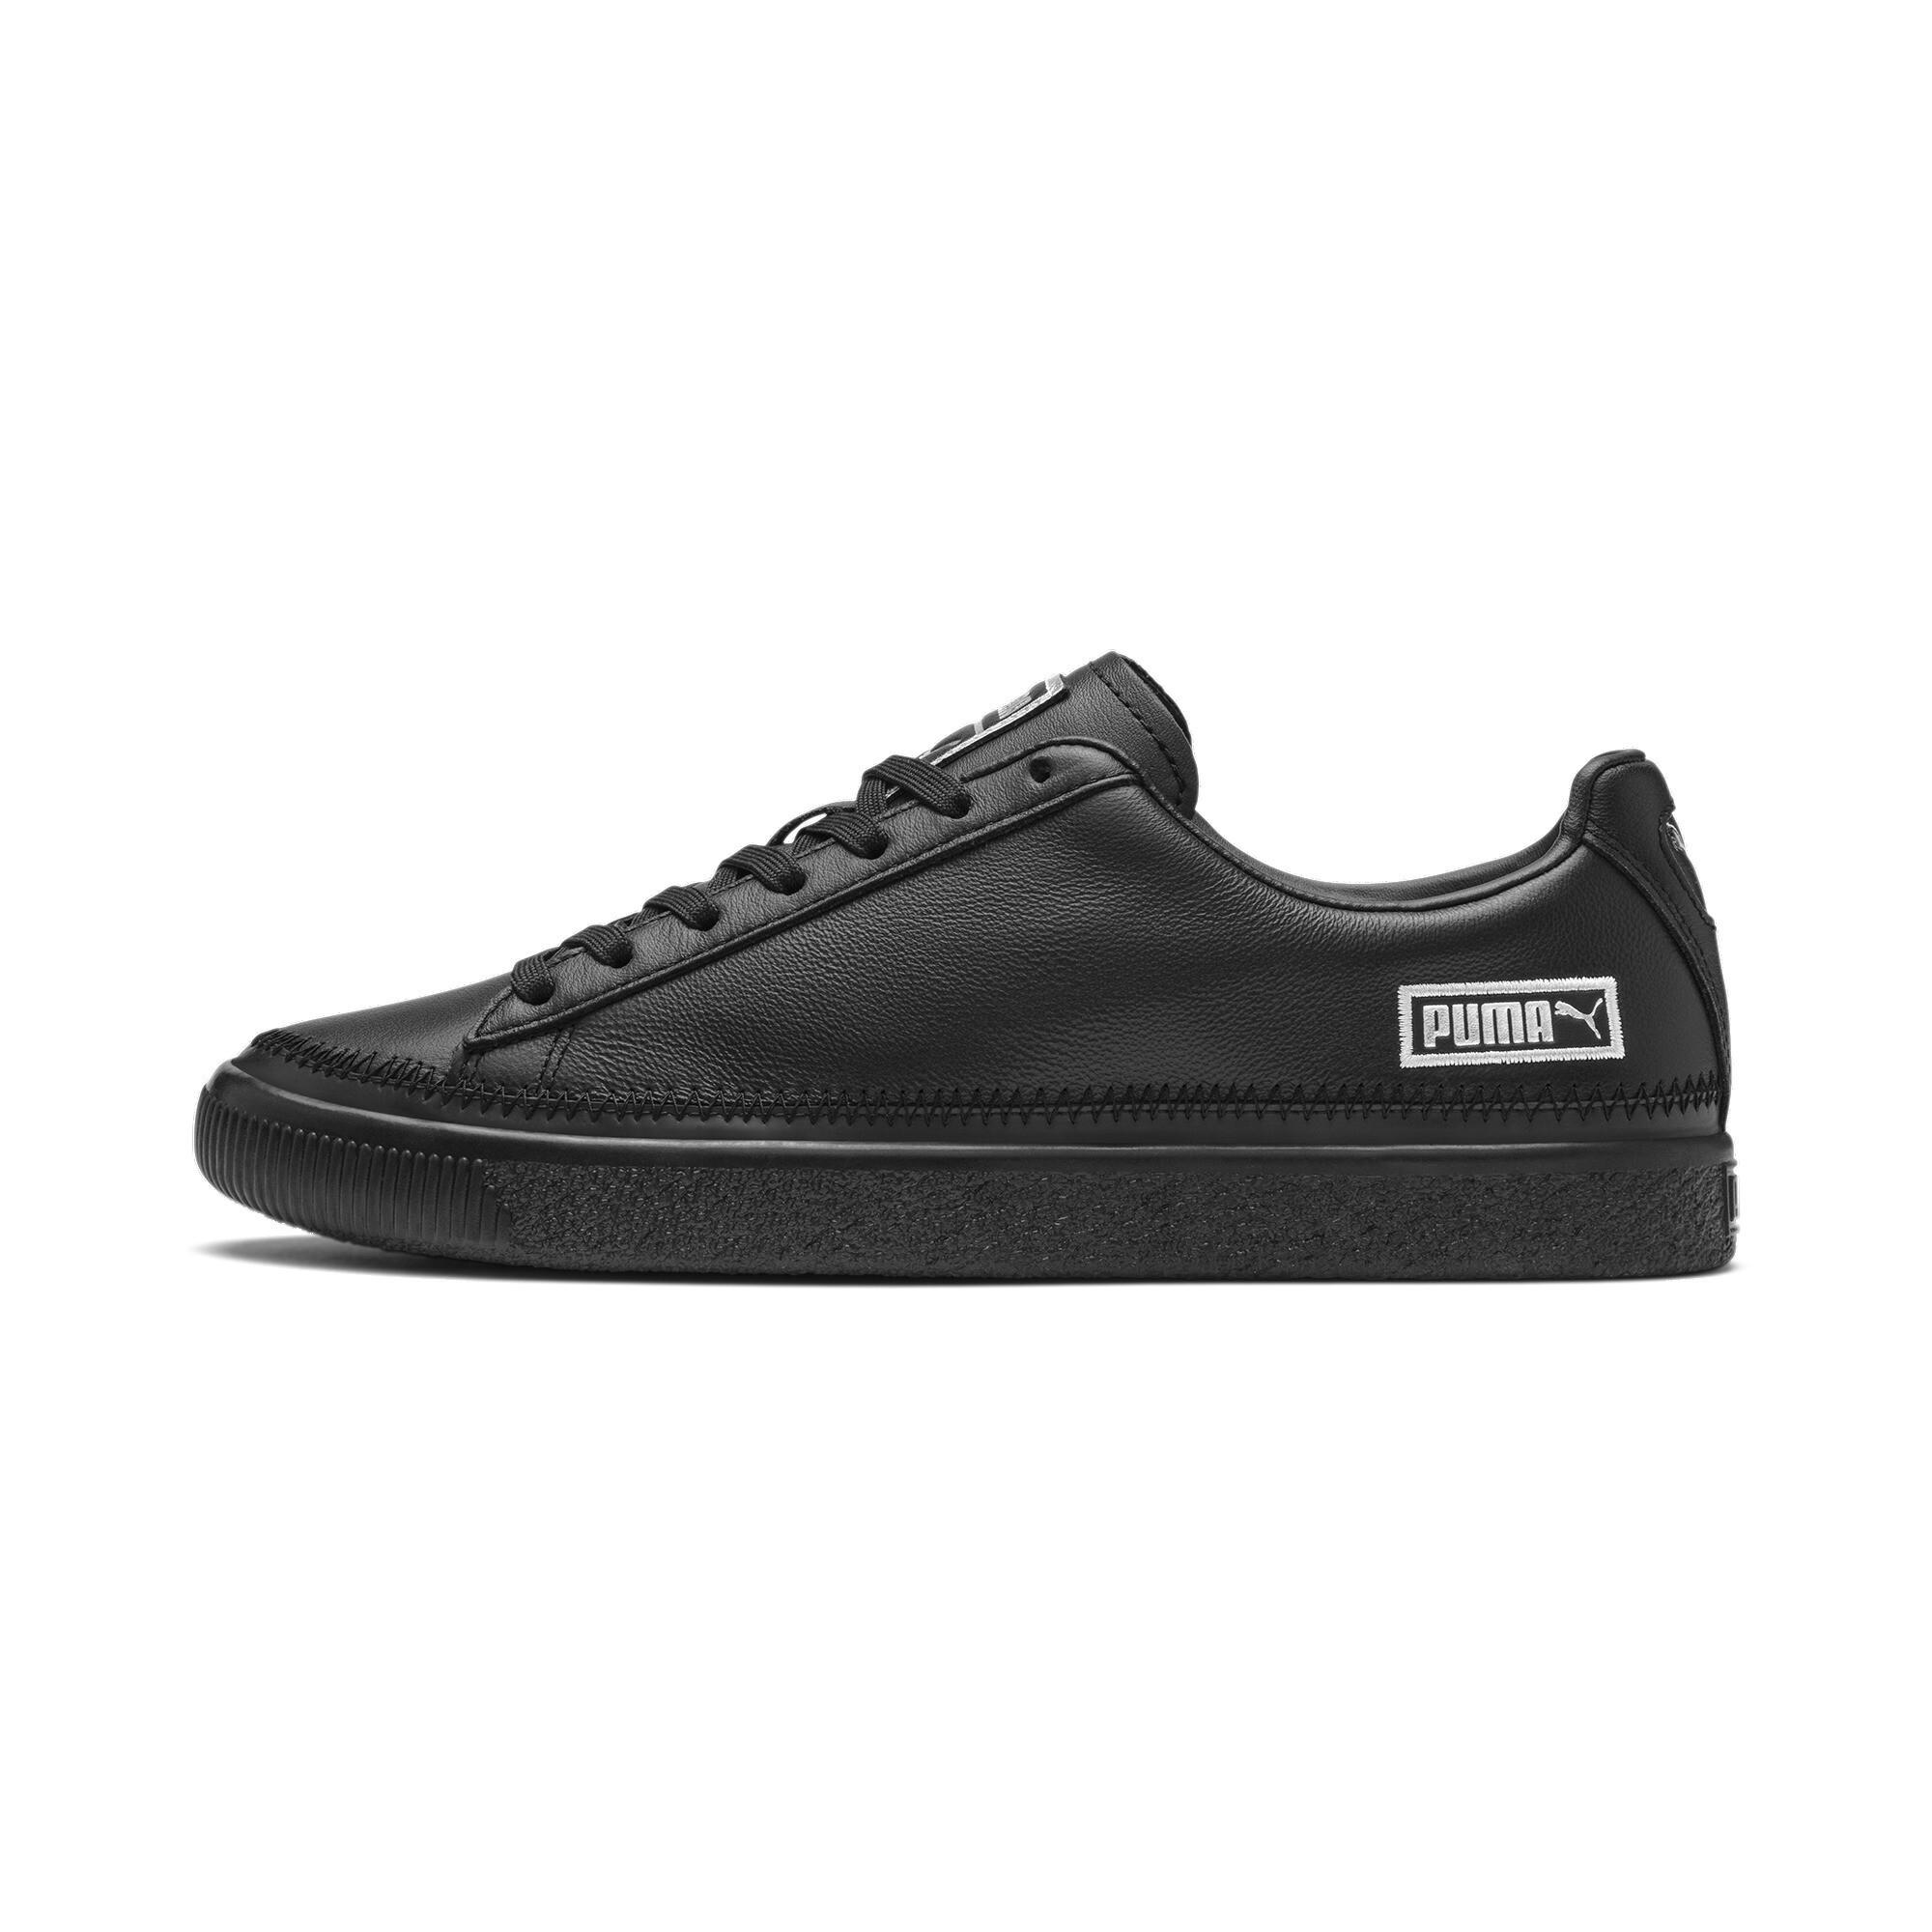 Indexbild 16 - PUMA Basket Stitch Sneaker Unisex Schuhe Neu